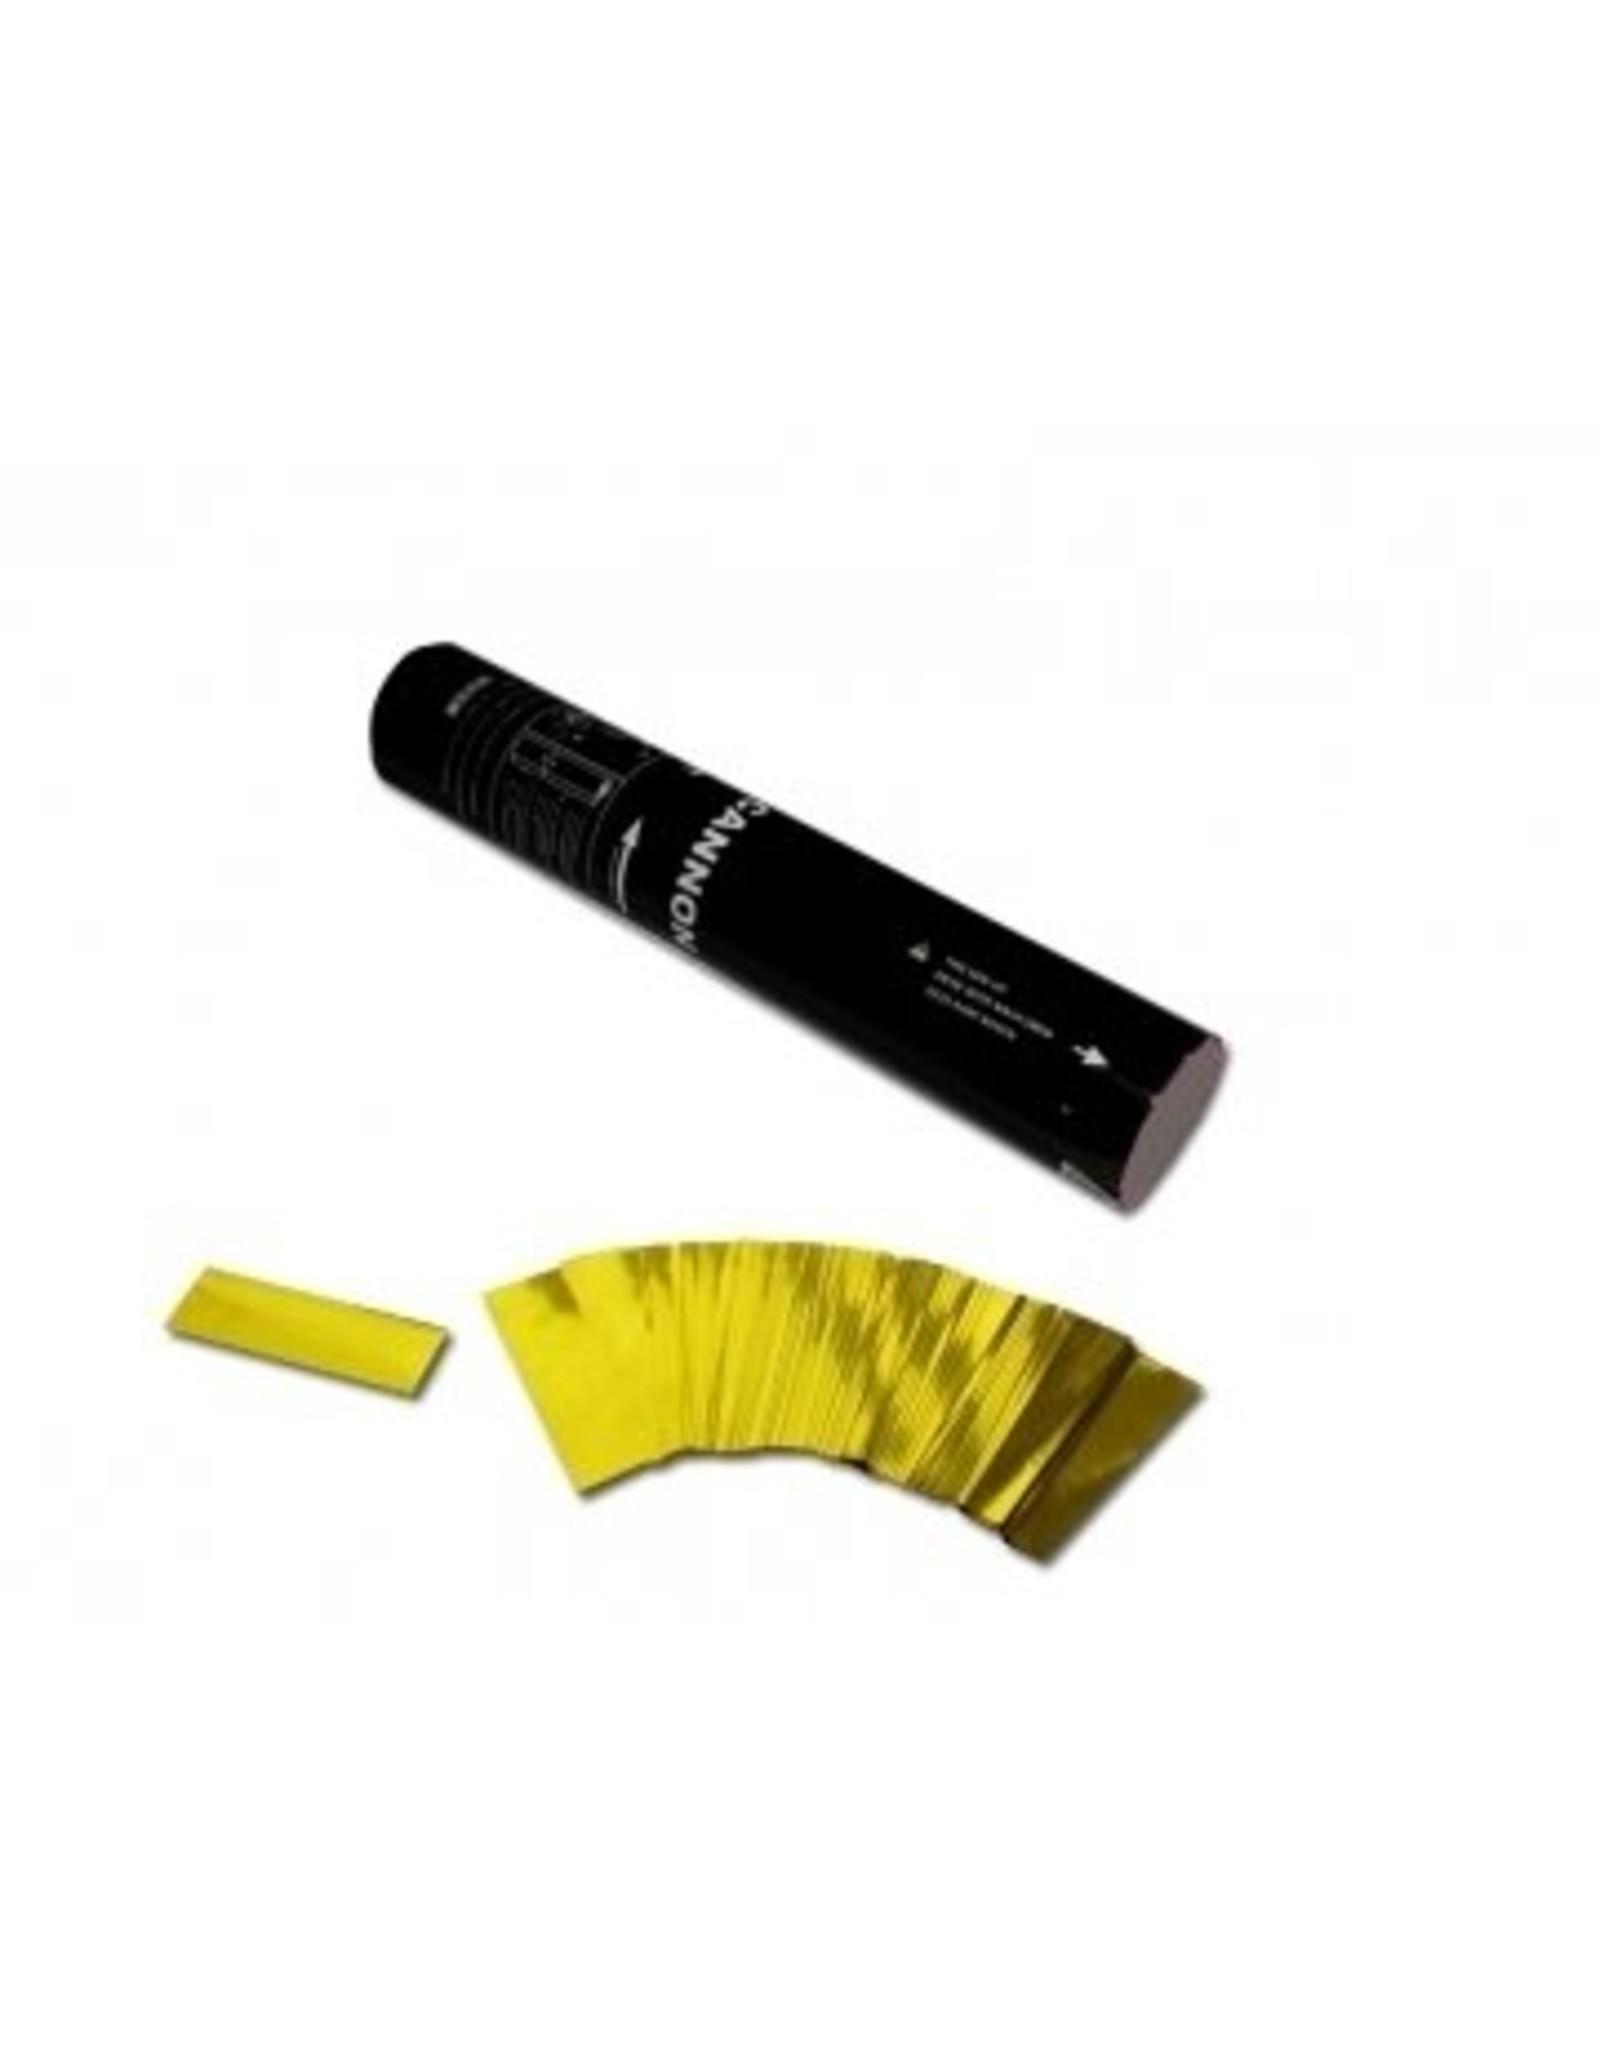 MAGICFX confetti Shooter 28 CM Goud Metalic